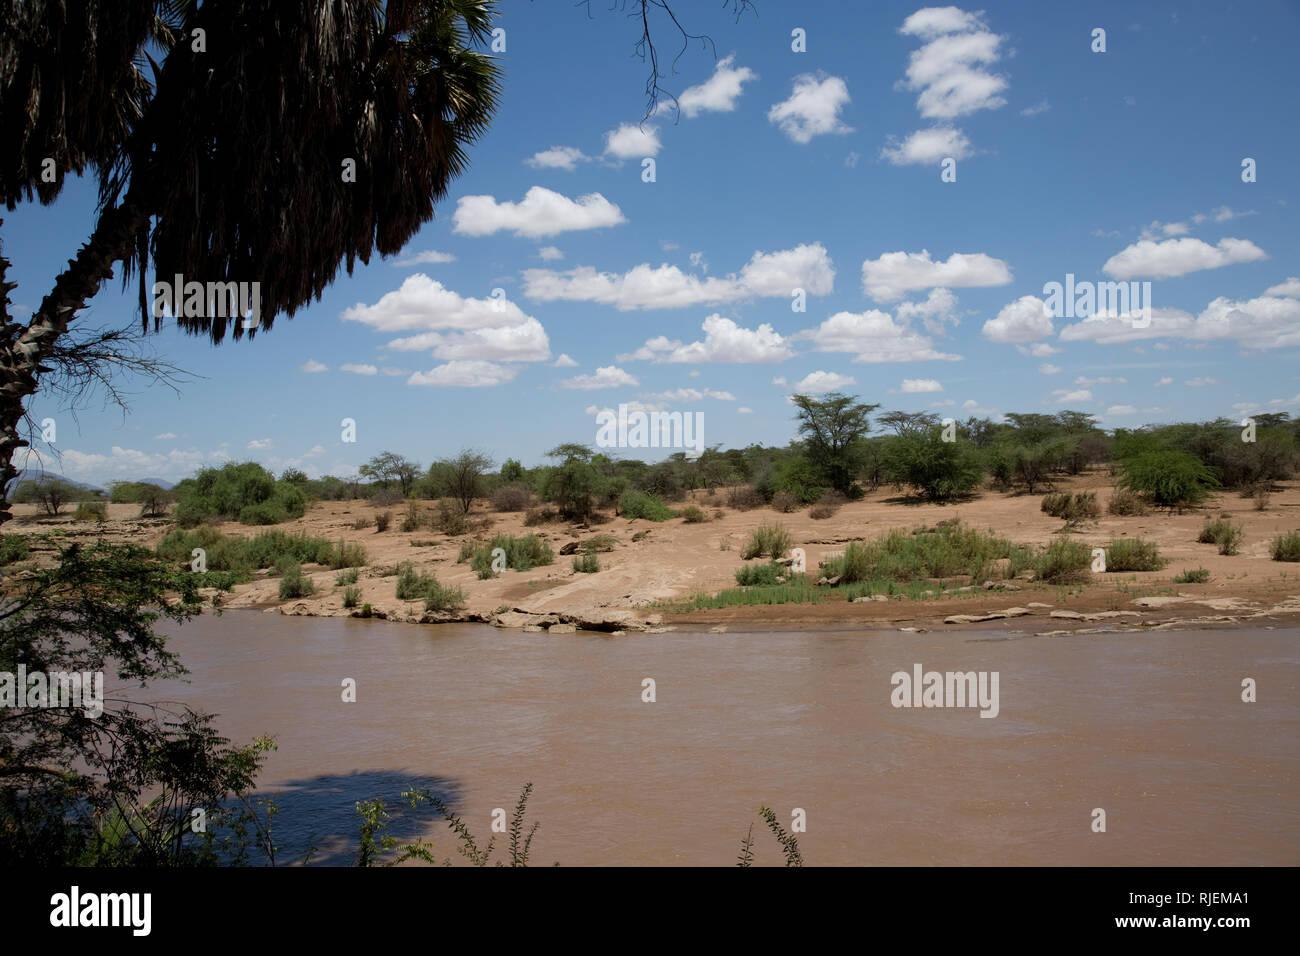 Scenic of Ewaso Ngiro river, blue sky with fluffy clouds, Shaba National Reserve, Kenya - Stock Image